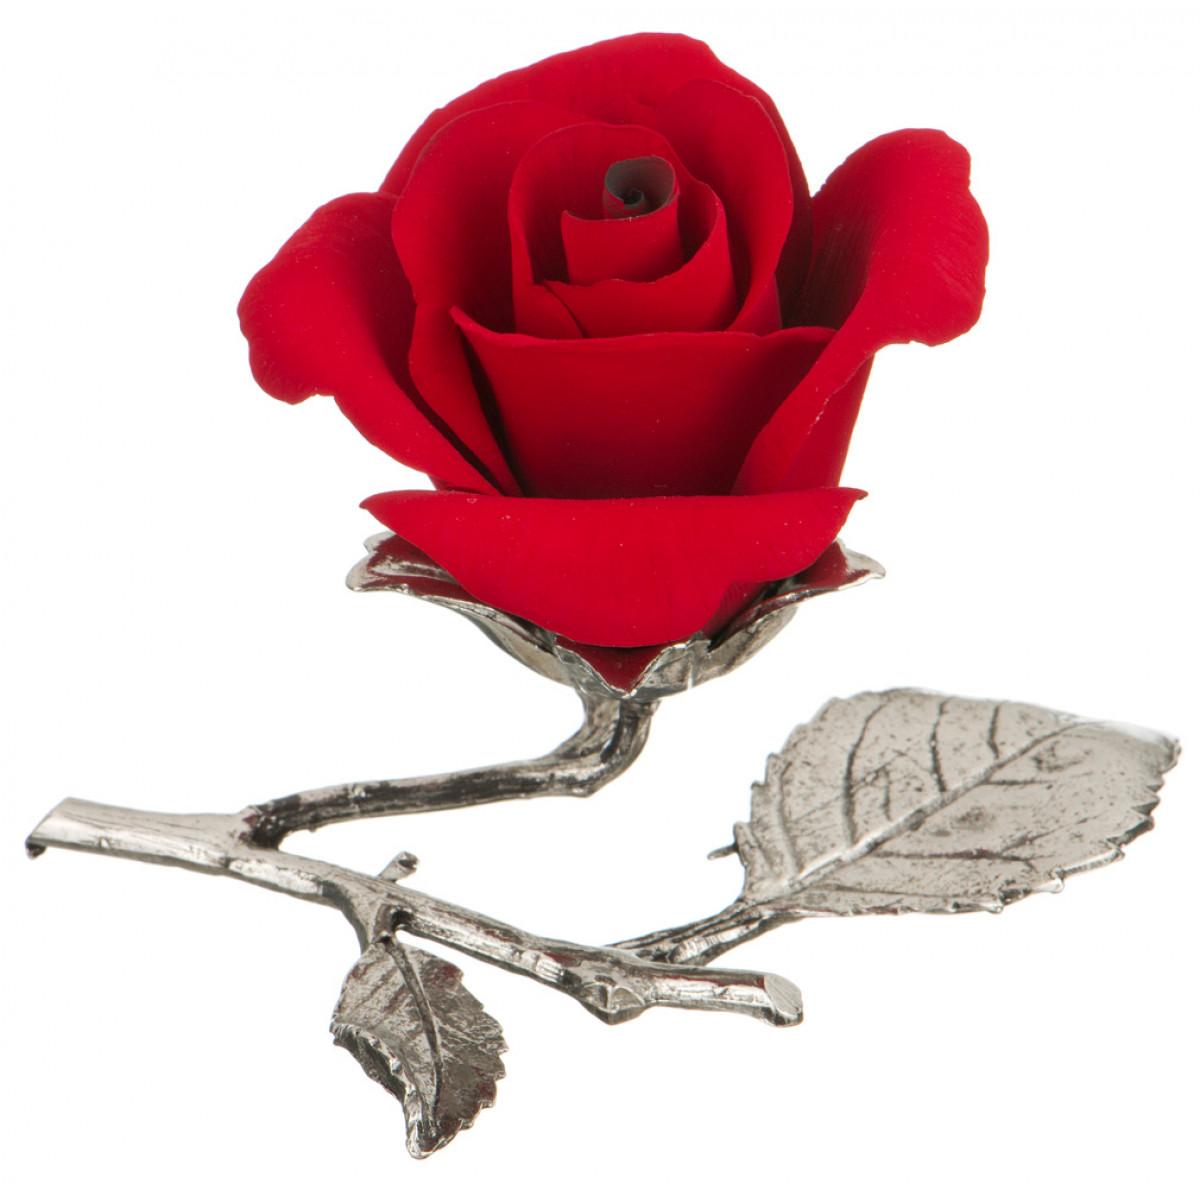 все цены на Искусственные растения Napoleon Искусственный цветок Jodene (8х8х10 см) онлайн